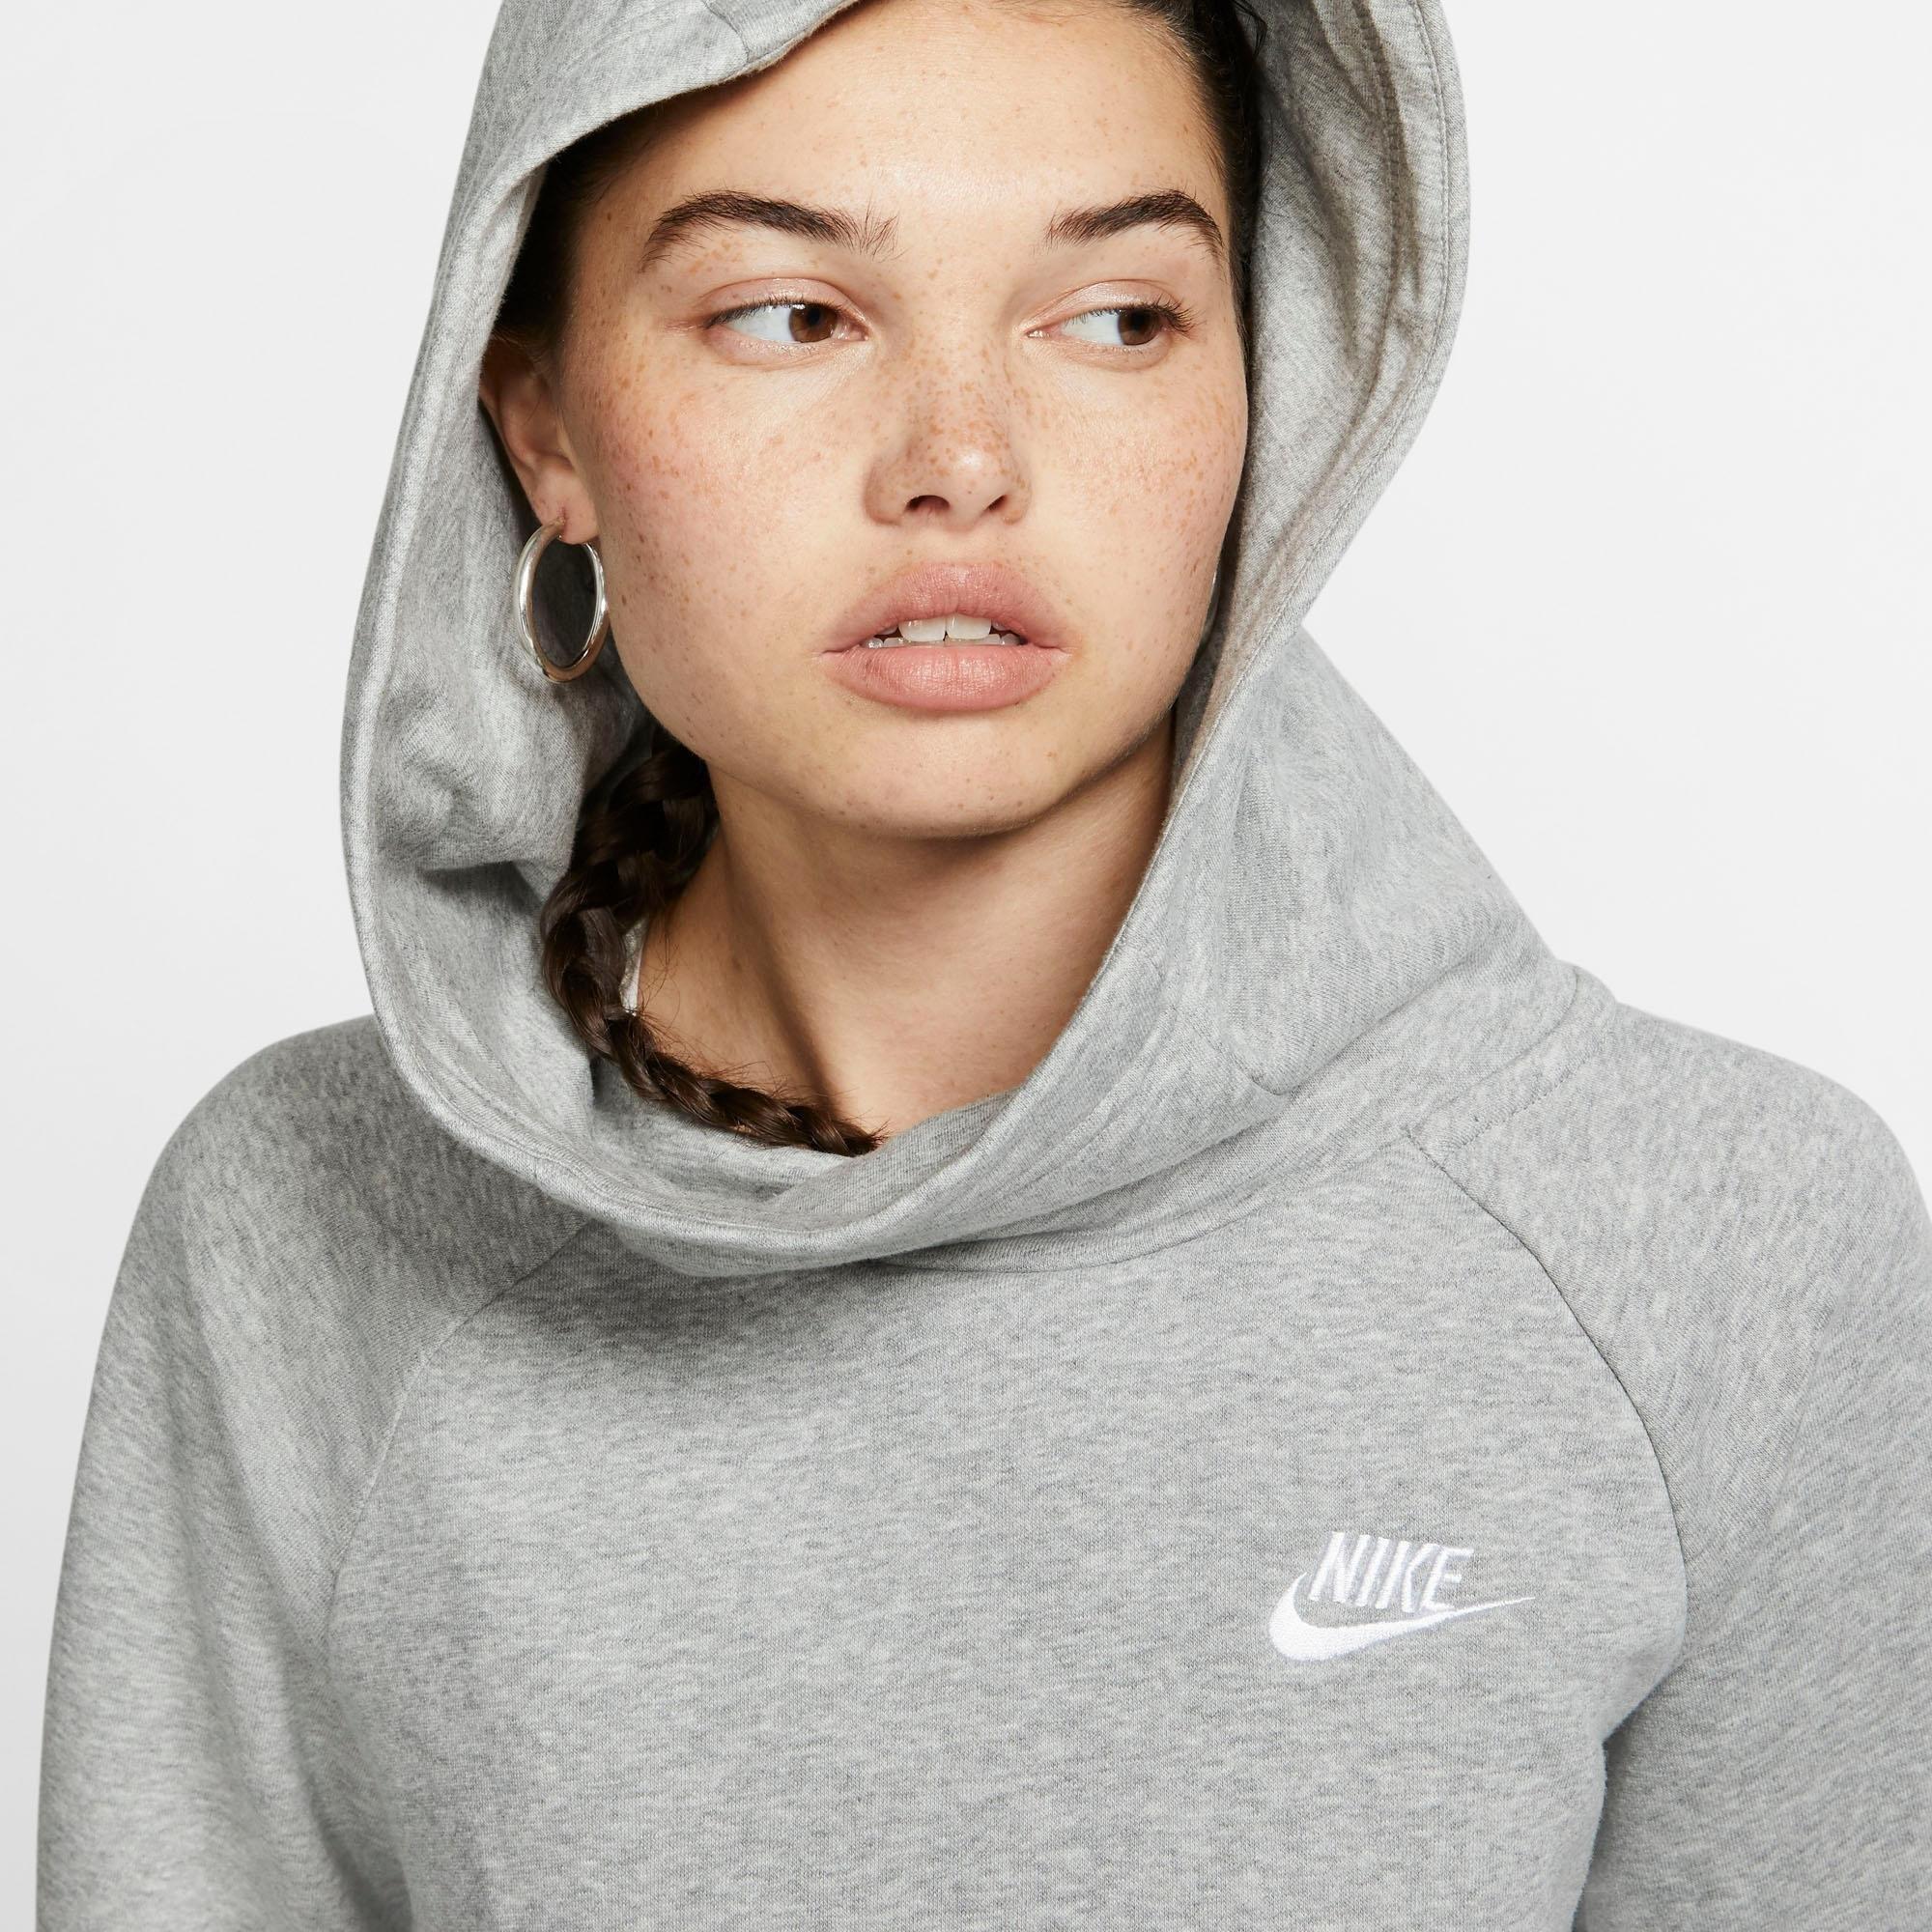 Nike Sportswear hoodie »Essential Women's Funnel-Neck Fleece Pullover Hoodie« nu online kopen bij OTTO